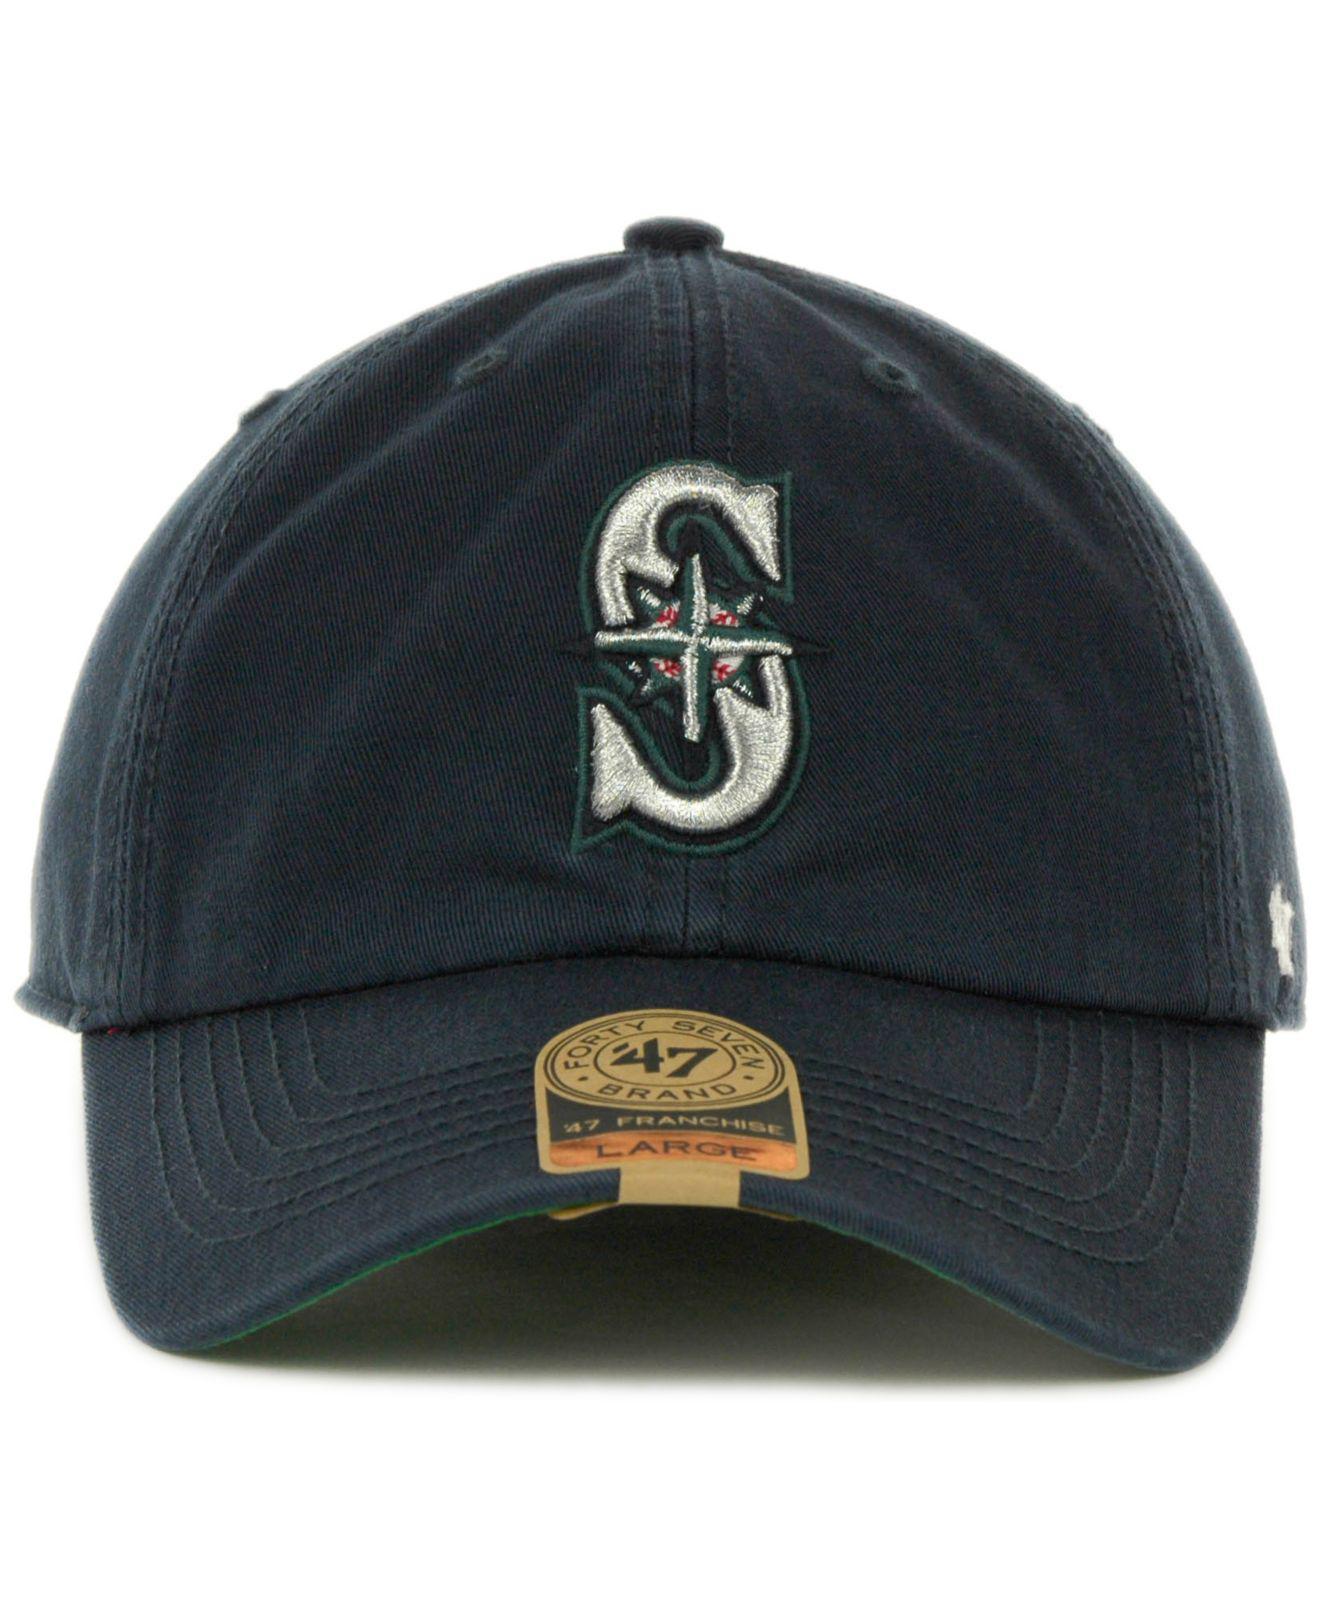 Lyst - 47 Brand Seattle Mariners Franchise Cap in Blue for Men 9eaf5d8433b7